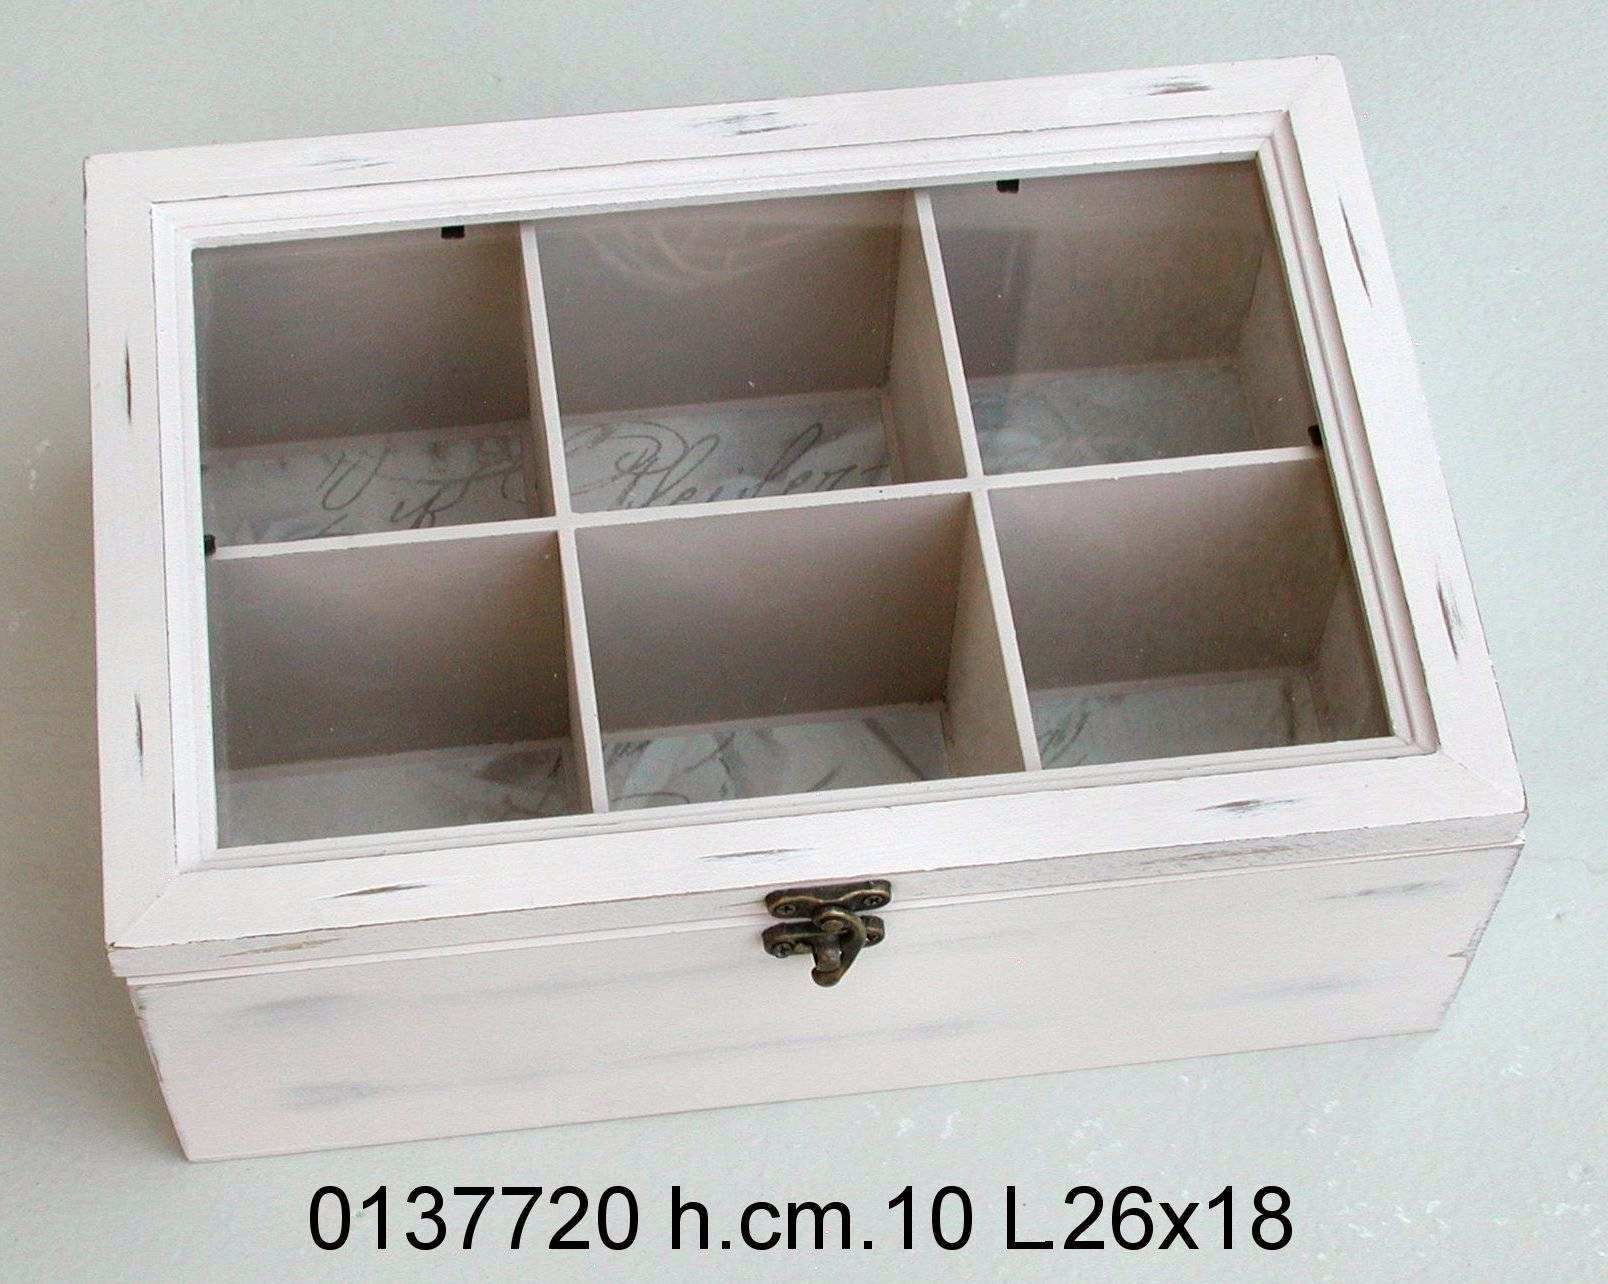 Antica soffitta scatola porta the t legno cuori sei posti tisane shabby chic - Porta per soffitta ...